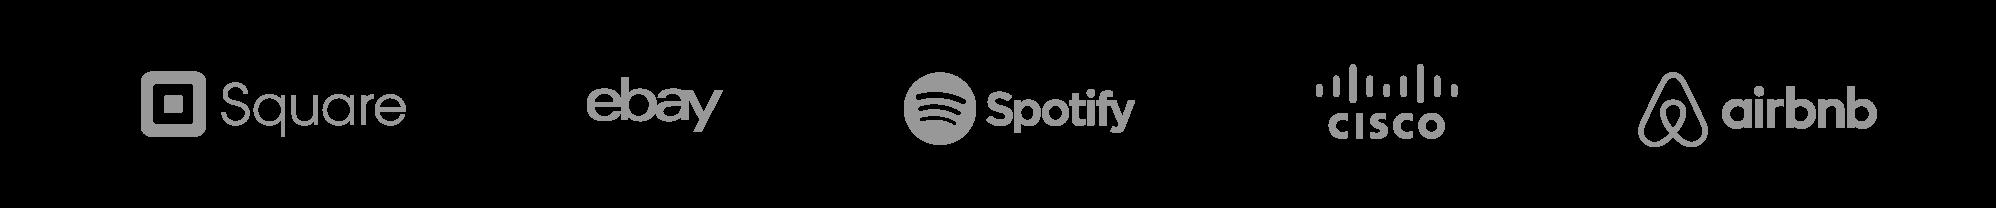 Clients JIRA: Square, eBay, Spotify, Cisco, Airbnb